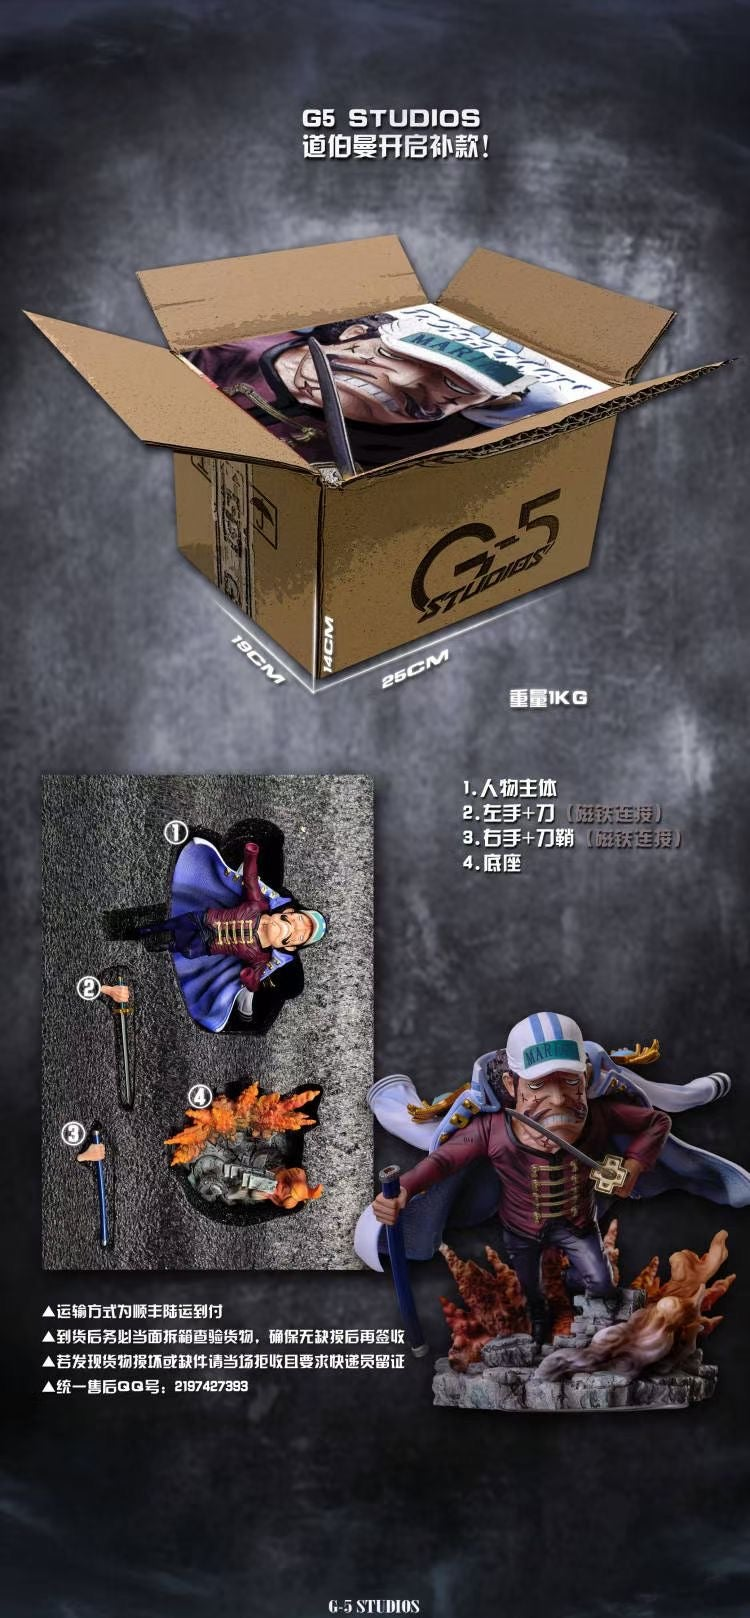 Image of [In-Stock]One Piece G5 Doberman ,Dalmatian,Raiz Ashura, Kawamatsu Resin Statue